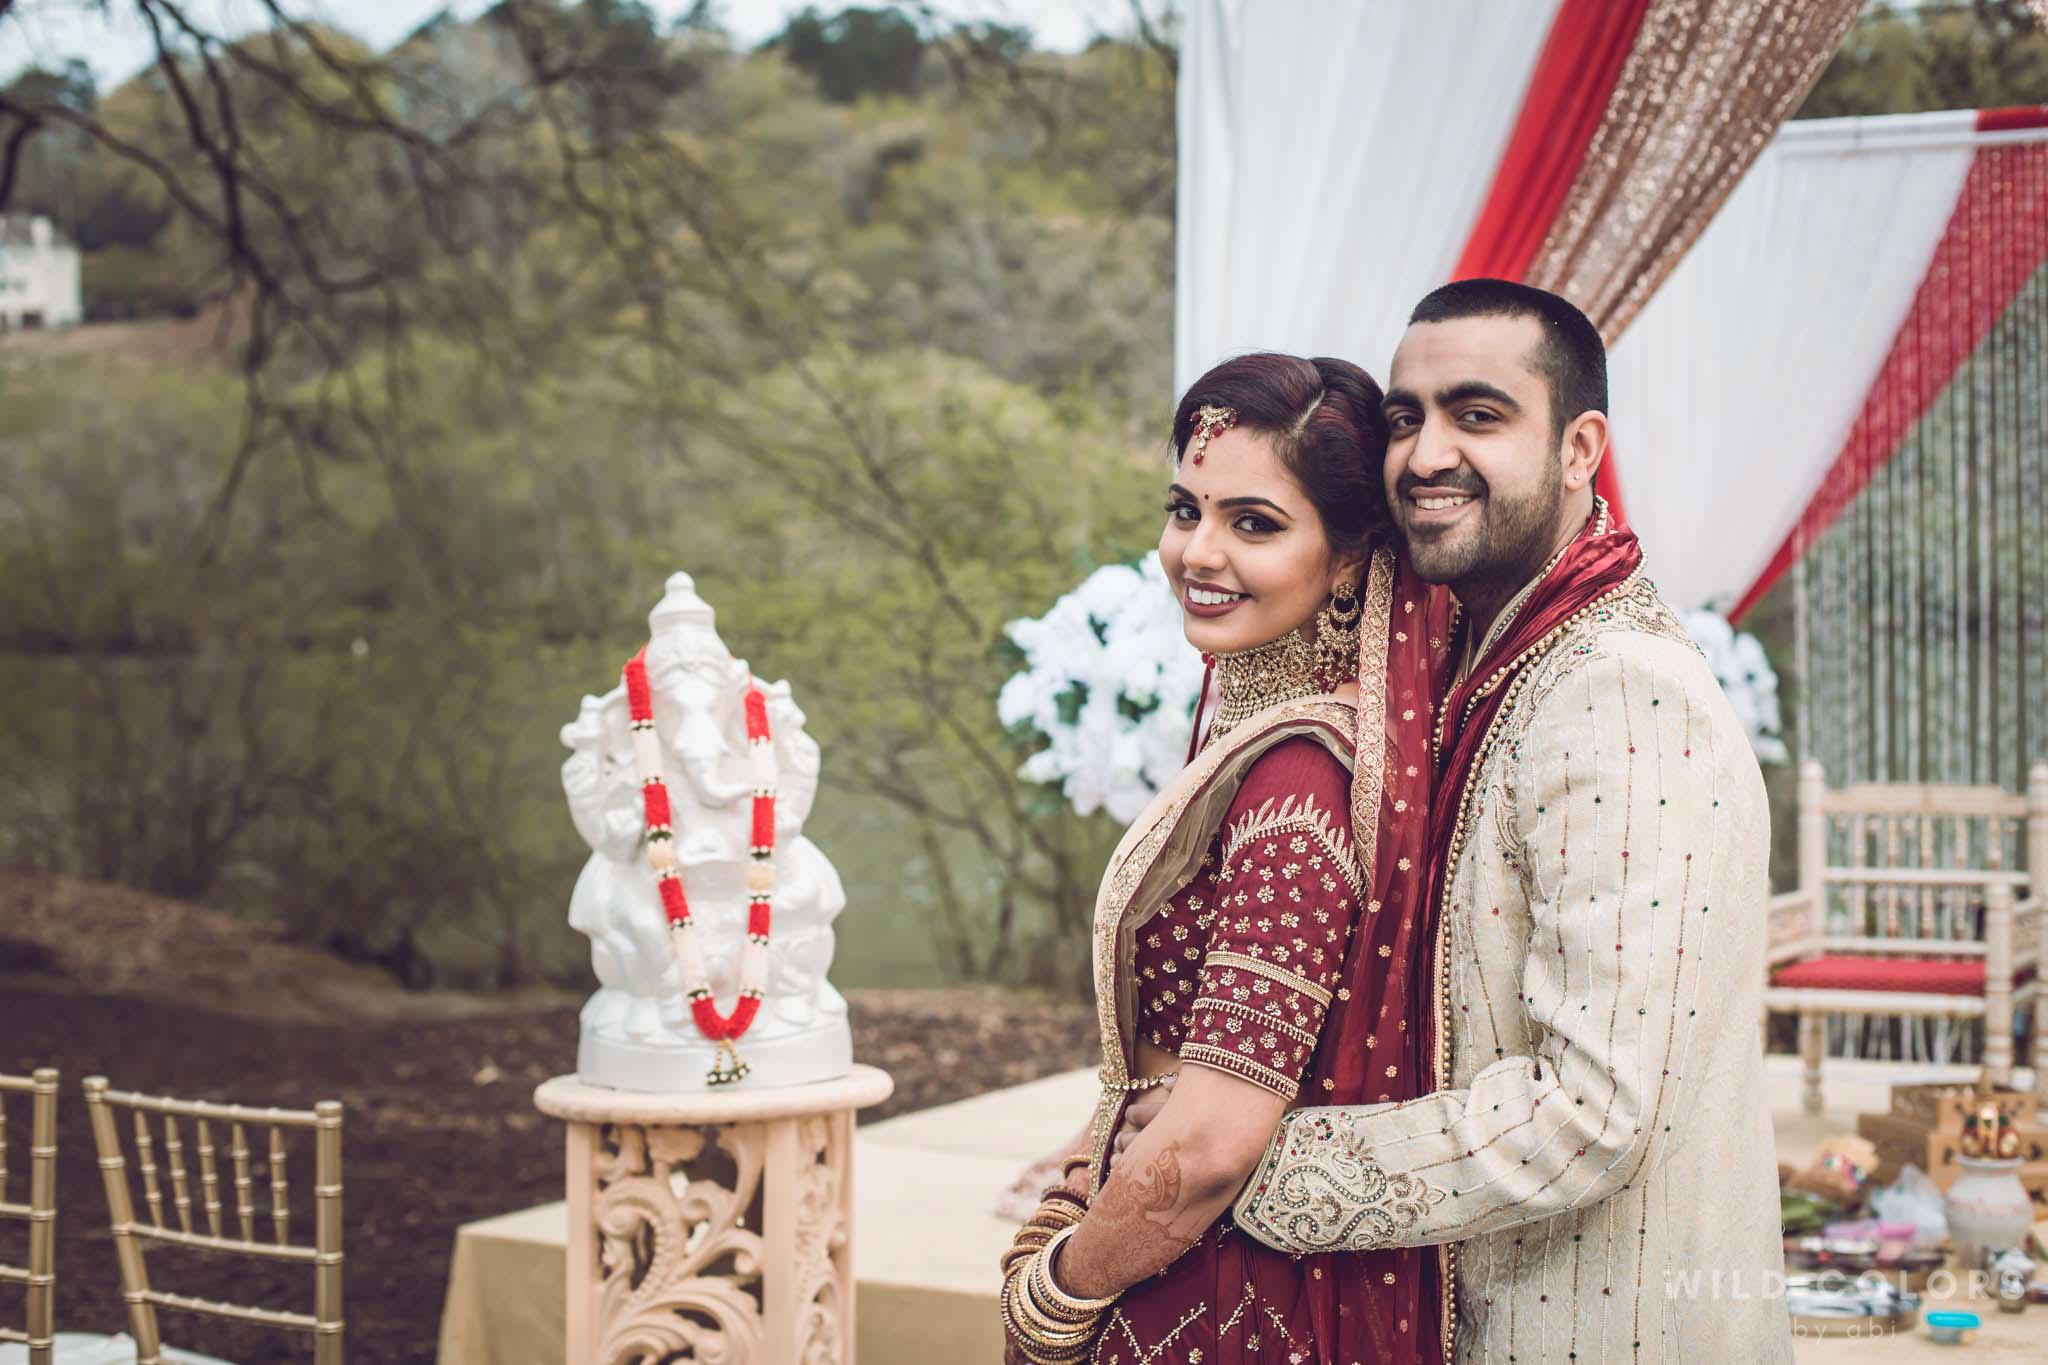 CANDID_INDIAN_WEDDING_ATLANTA_PHOTOGRAPHER-24.JPG